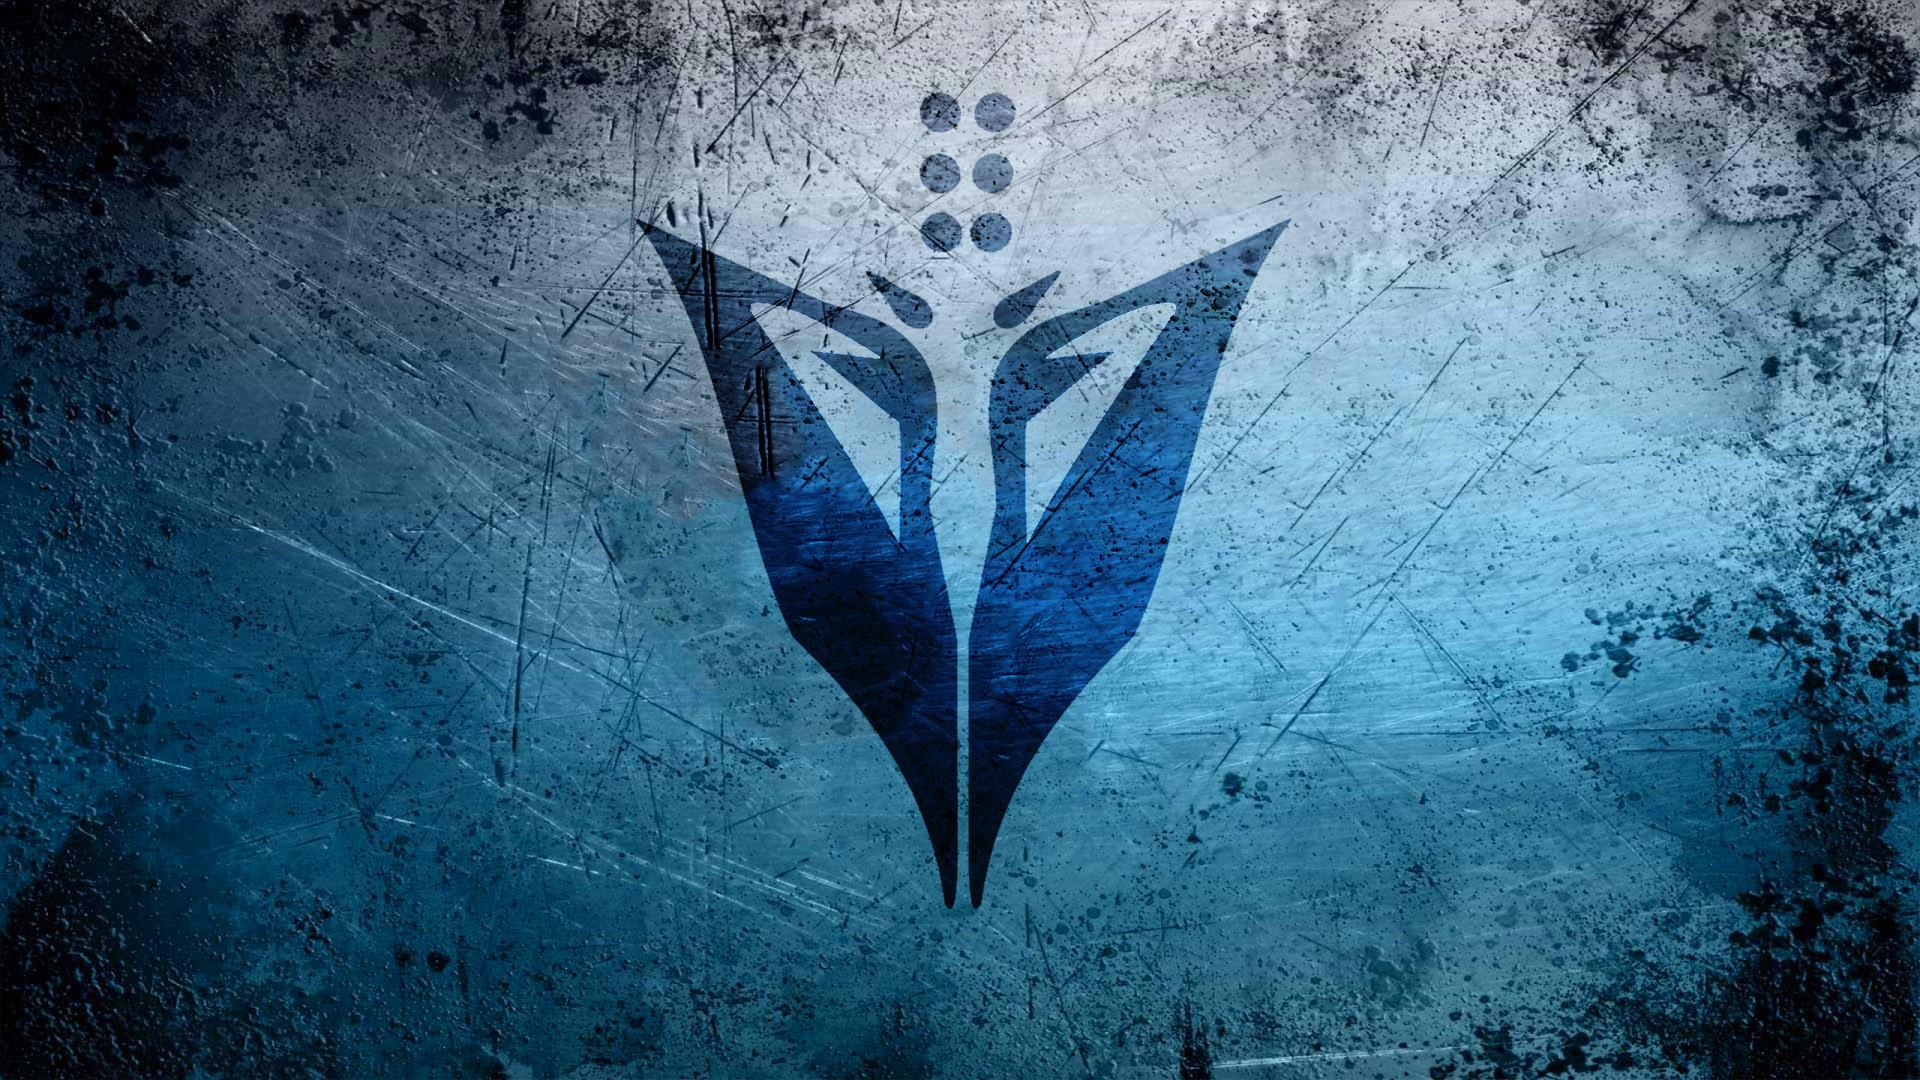 House of Wolves (Blue Scratch) by 1337NinjaSakura on DeviantArt